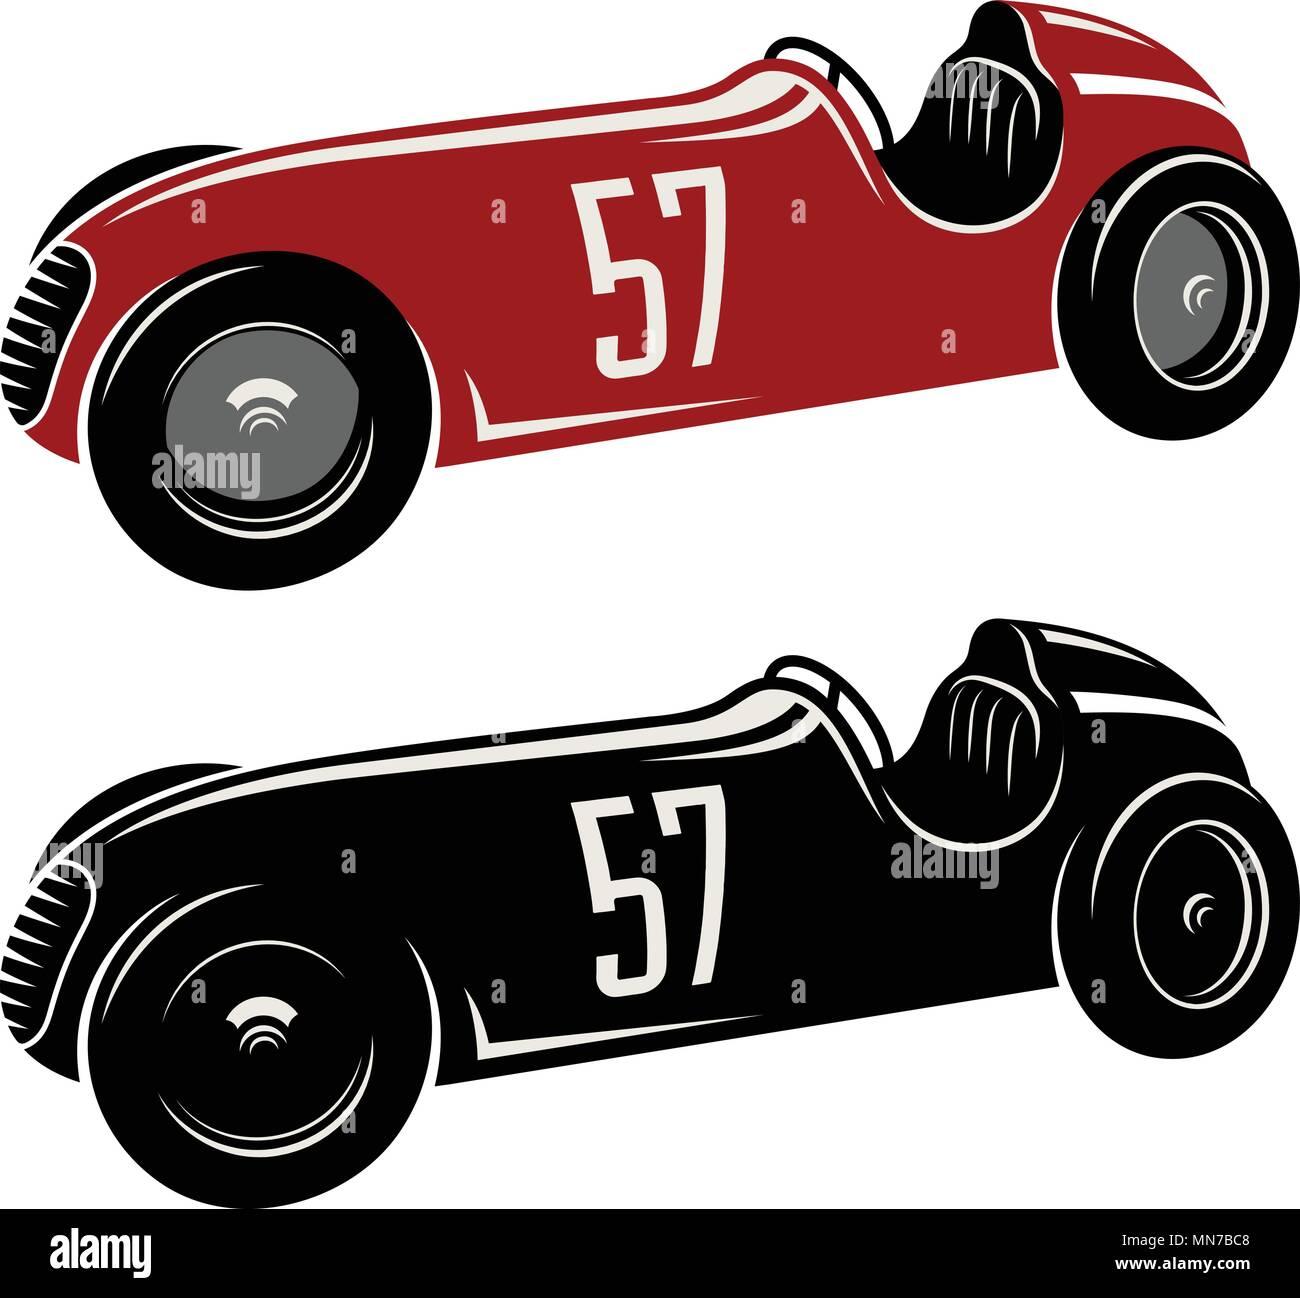 Racing Car Vector Illustration Vintage Sport Car Graphic Tee Stock Vector Image Art Alamy